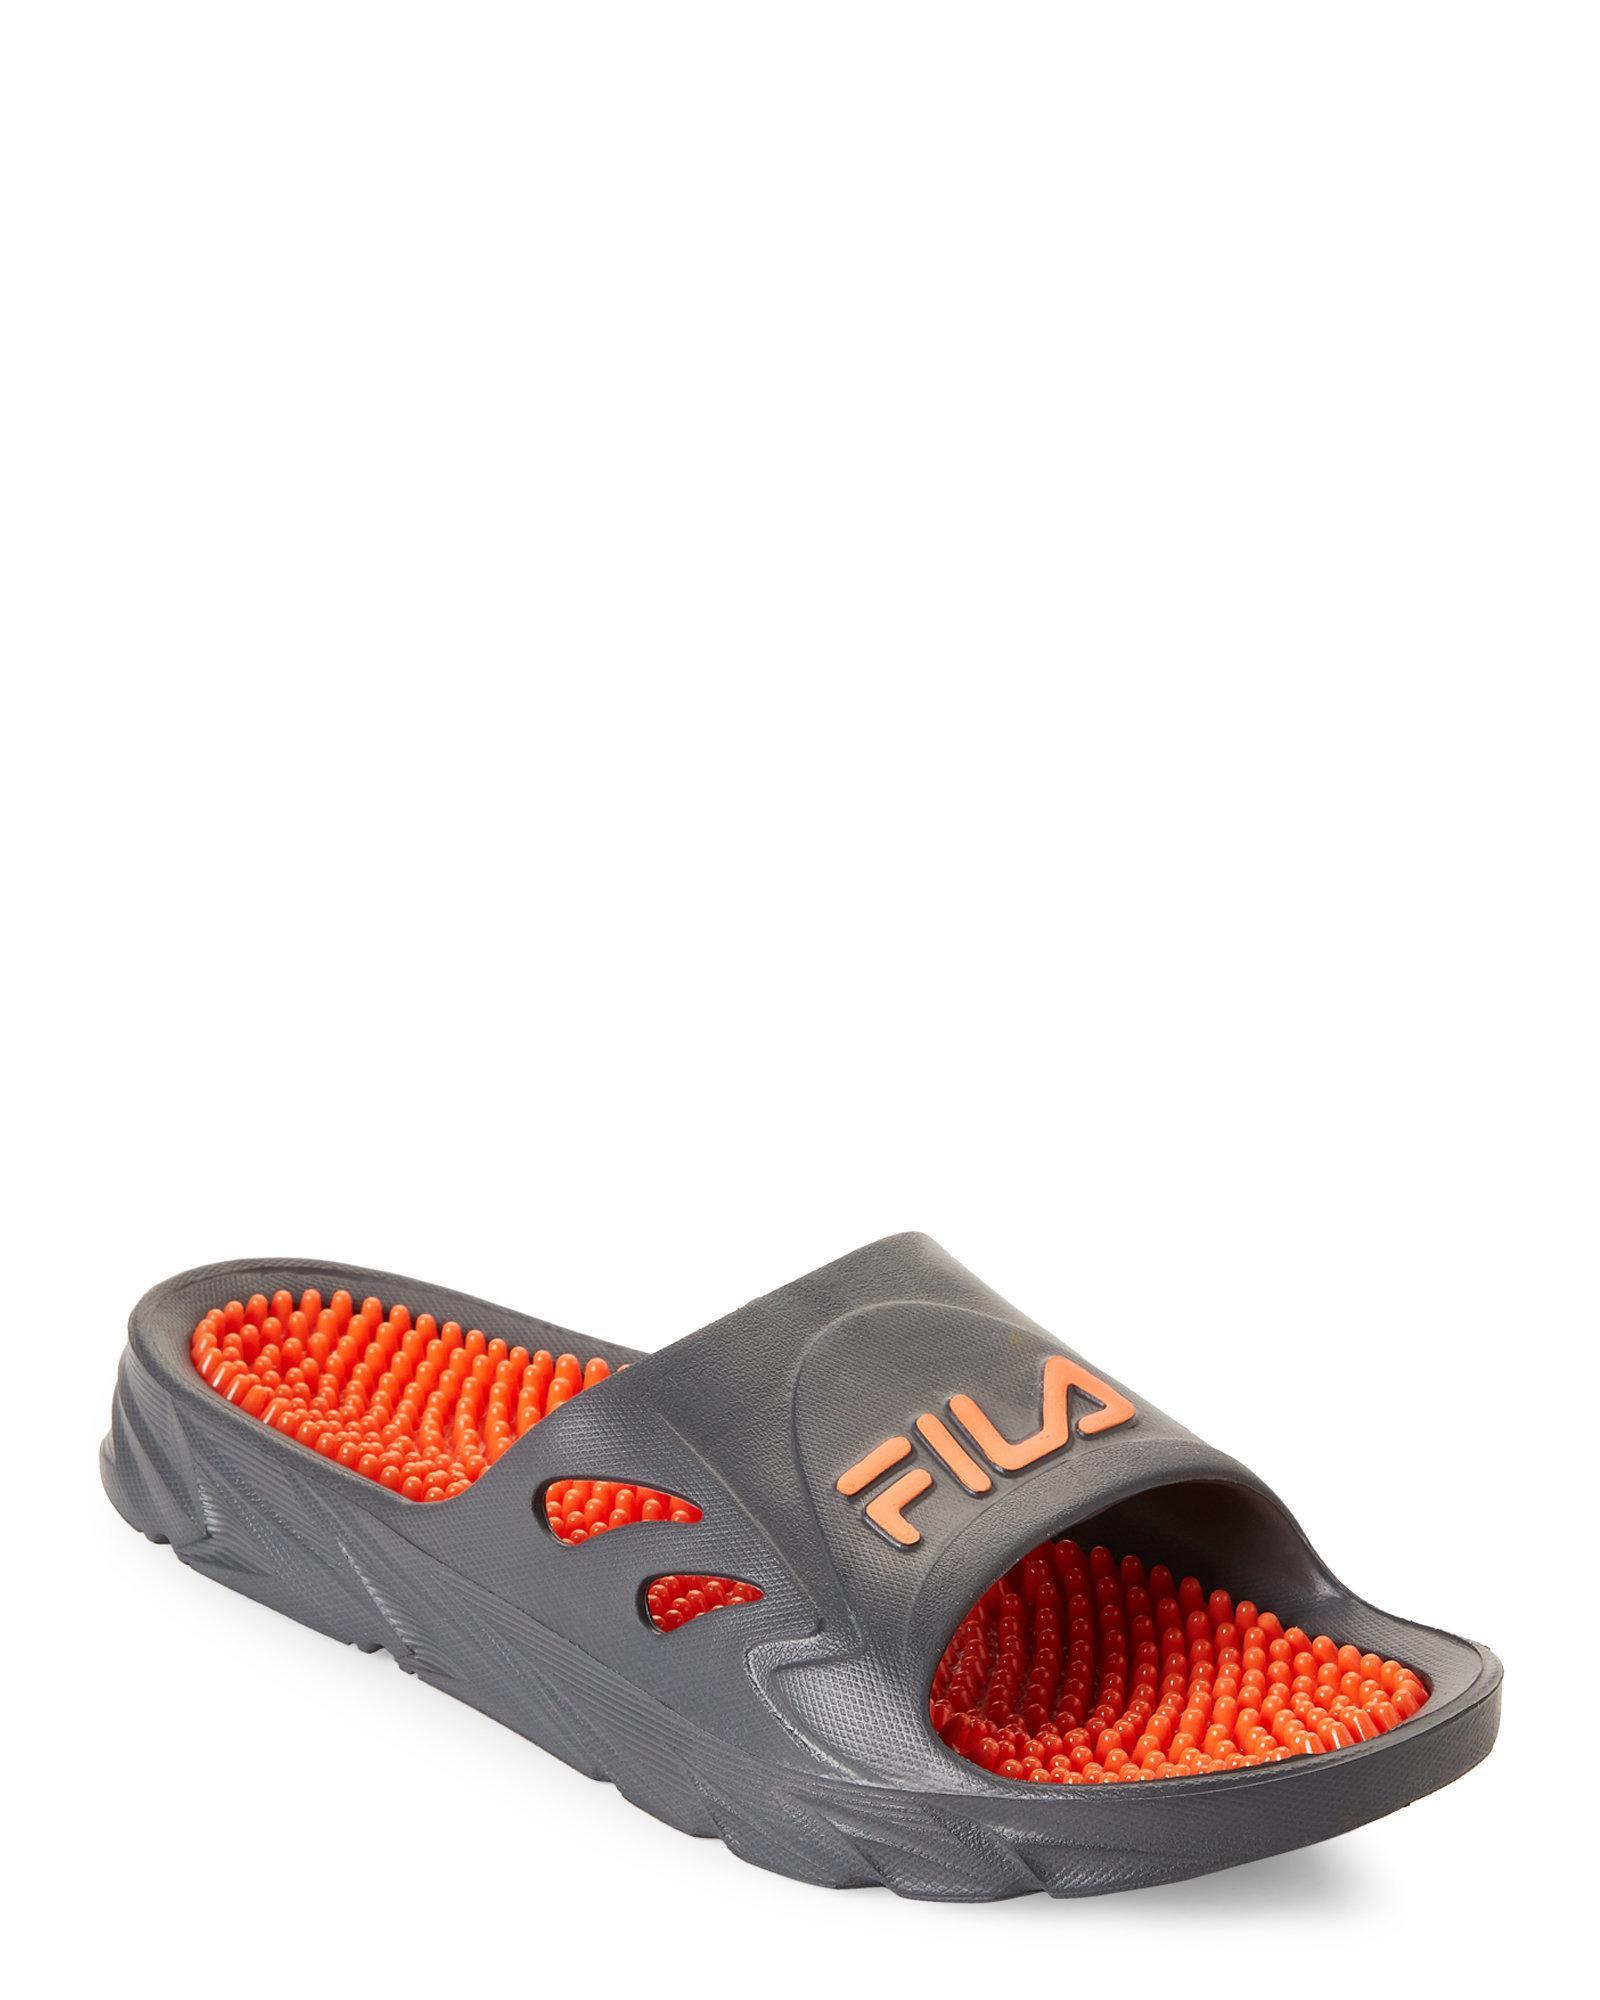 0e8e94eb4bd Lyst - Fila Grey   Orange Driftonic Massage Slide Sandals in Gray ...